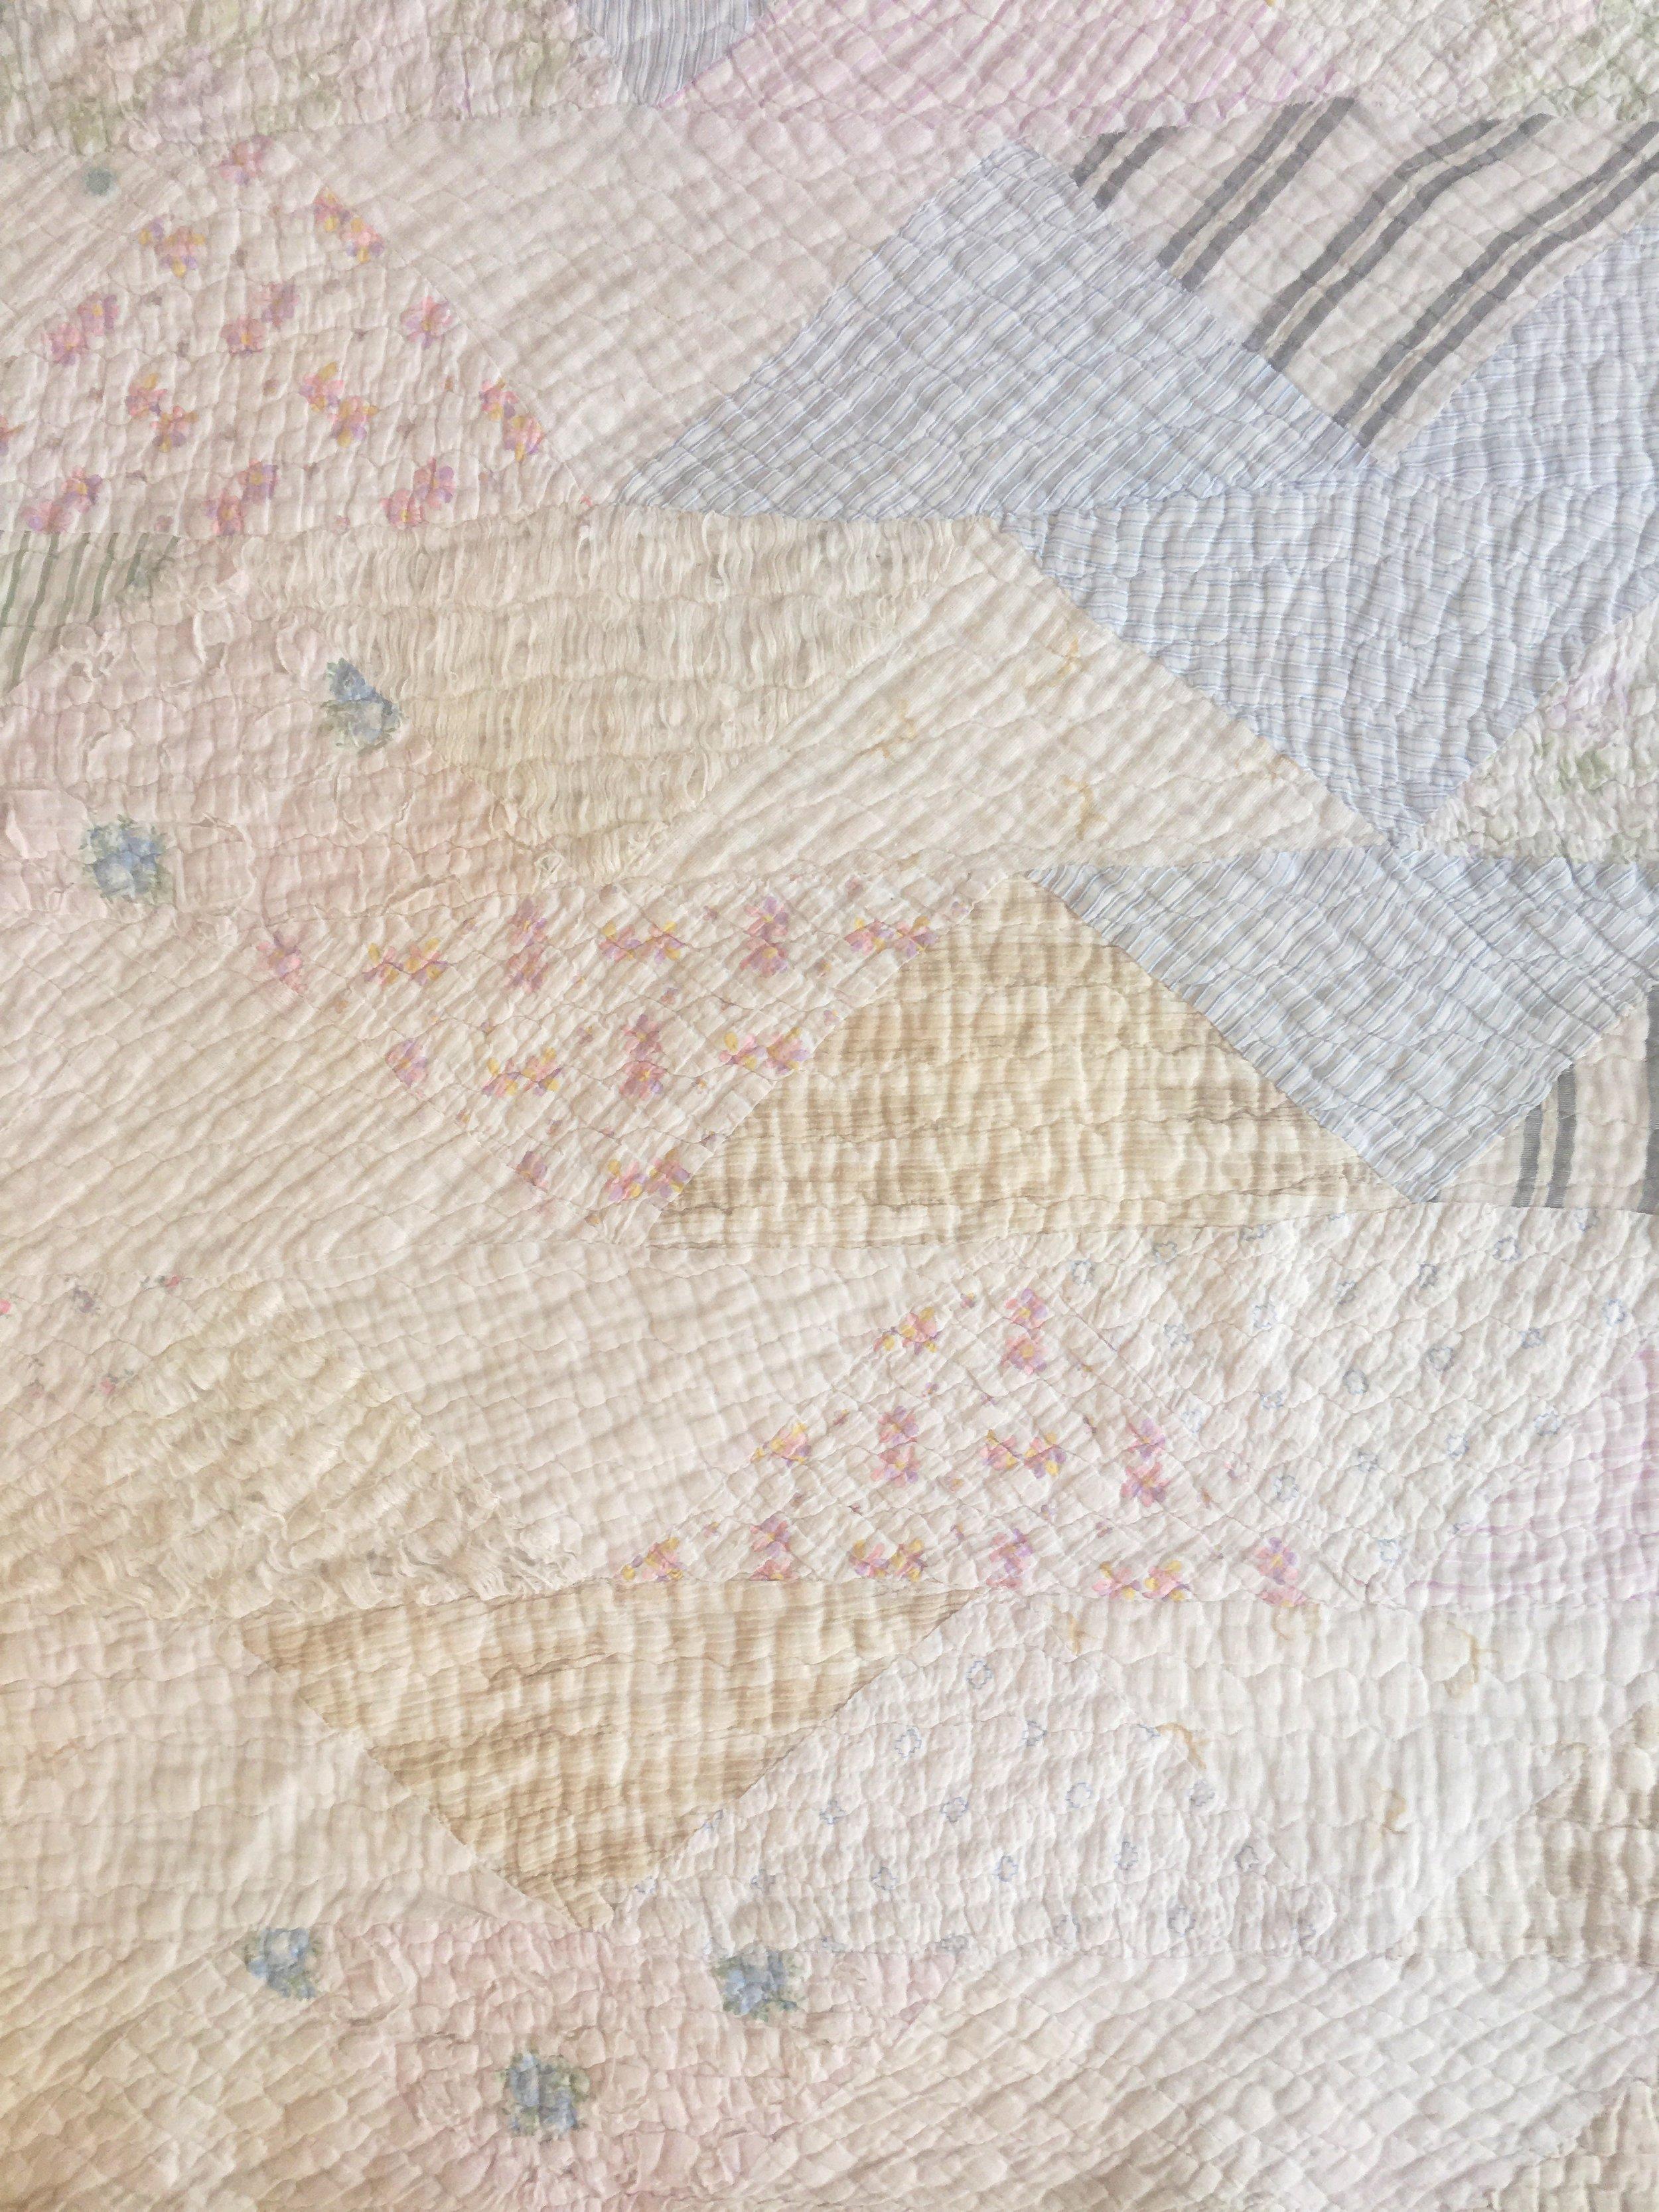 Worn vintage quilt I picked up at the  Tulsa Flea Market.